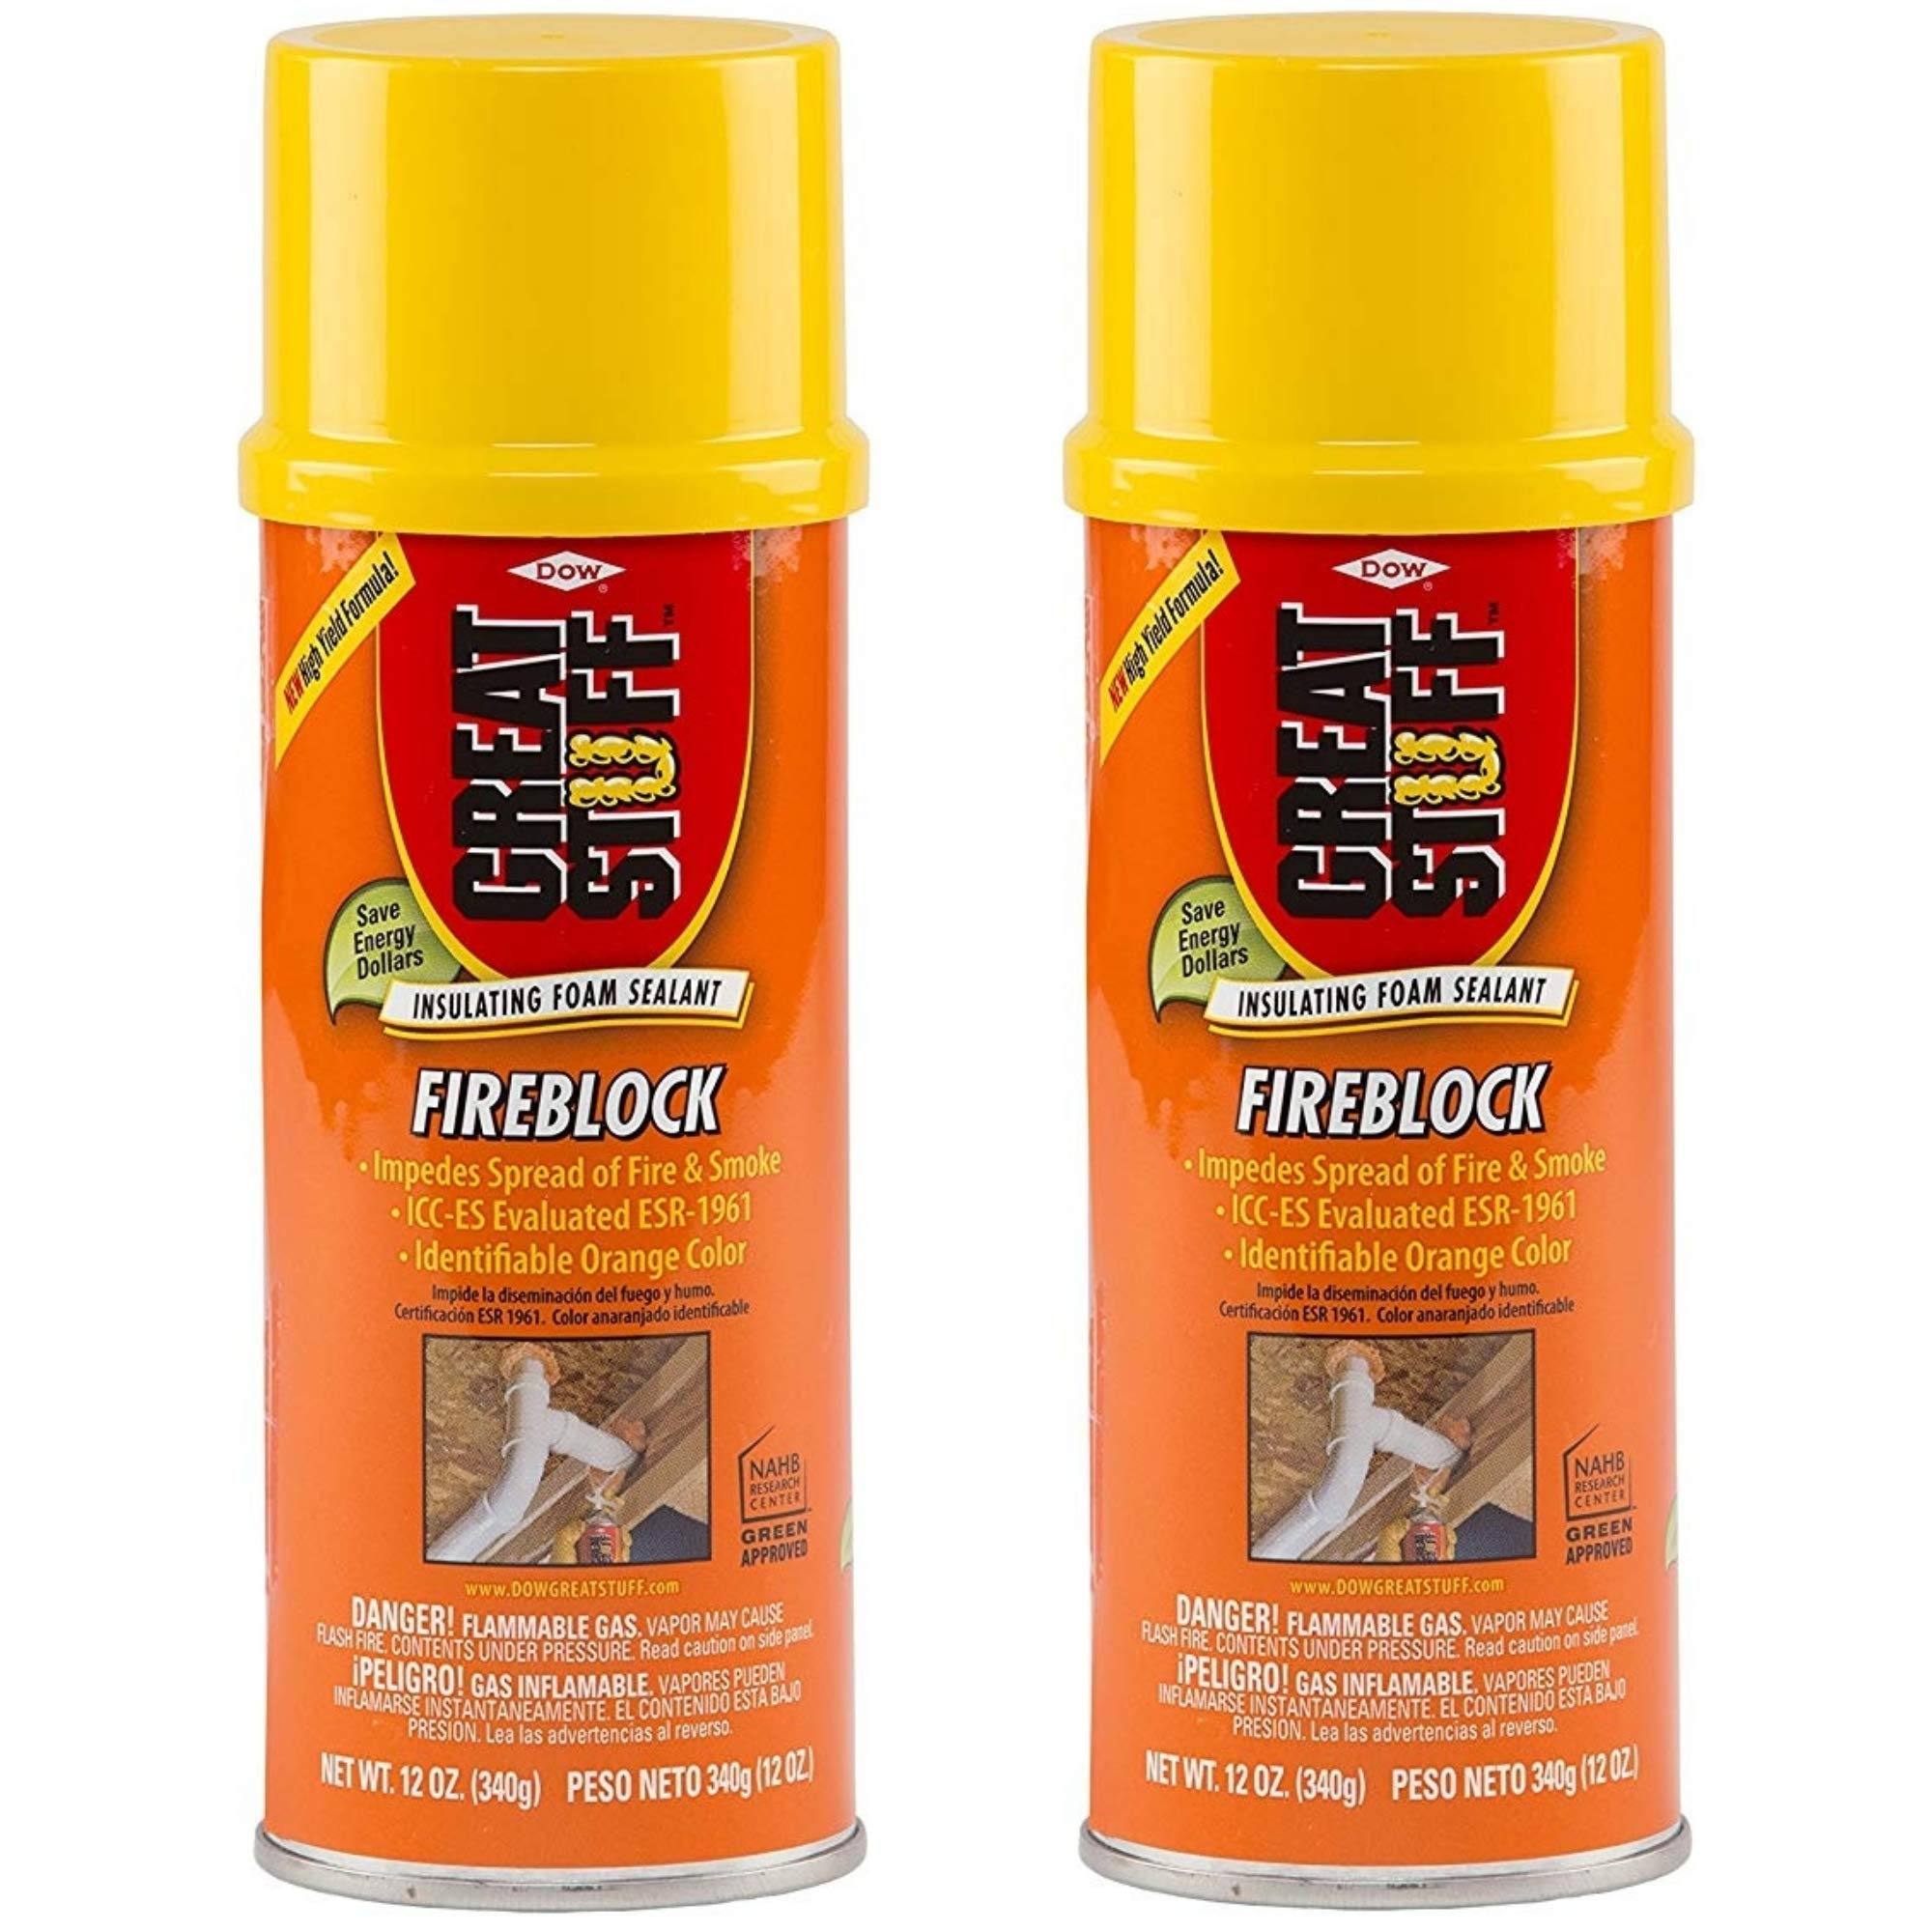 Great Stuff Fireblock 12 oz Insulating Foam Sealant 2 Pack product image